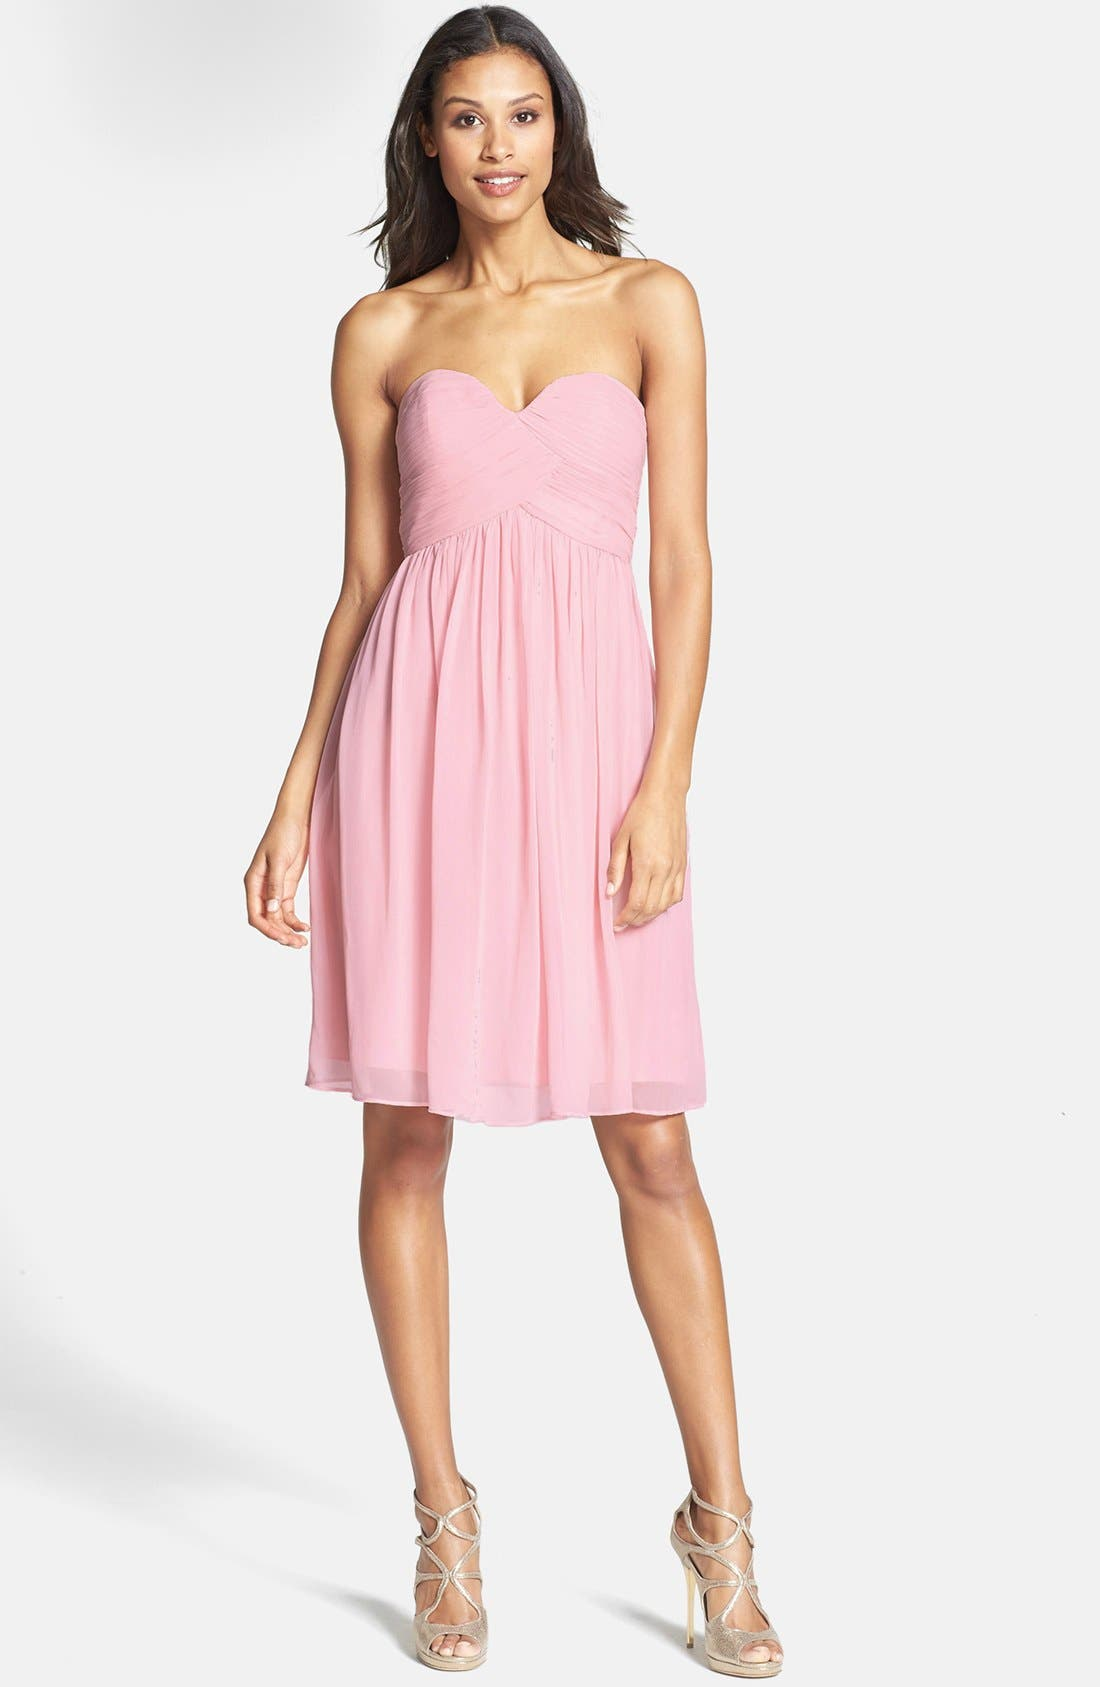 Alternate Image 1 Selected - Donna Morgan 'Morgan' Strapless Silk Chiffon Dress